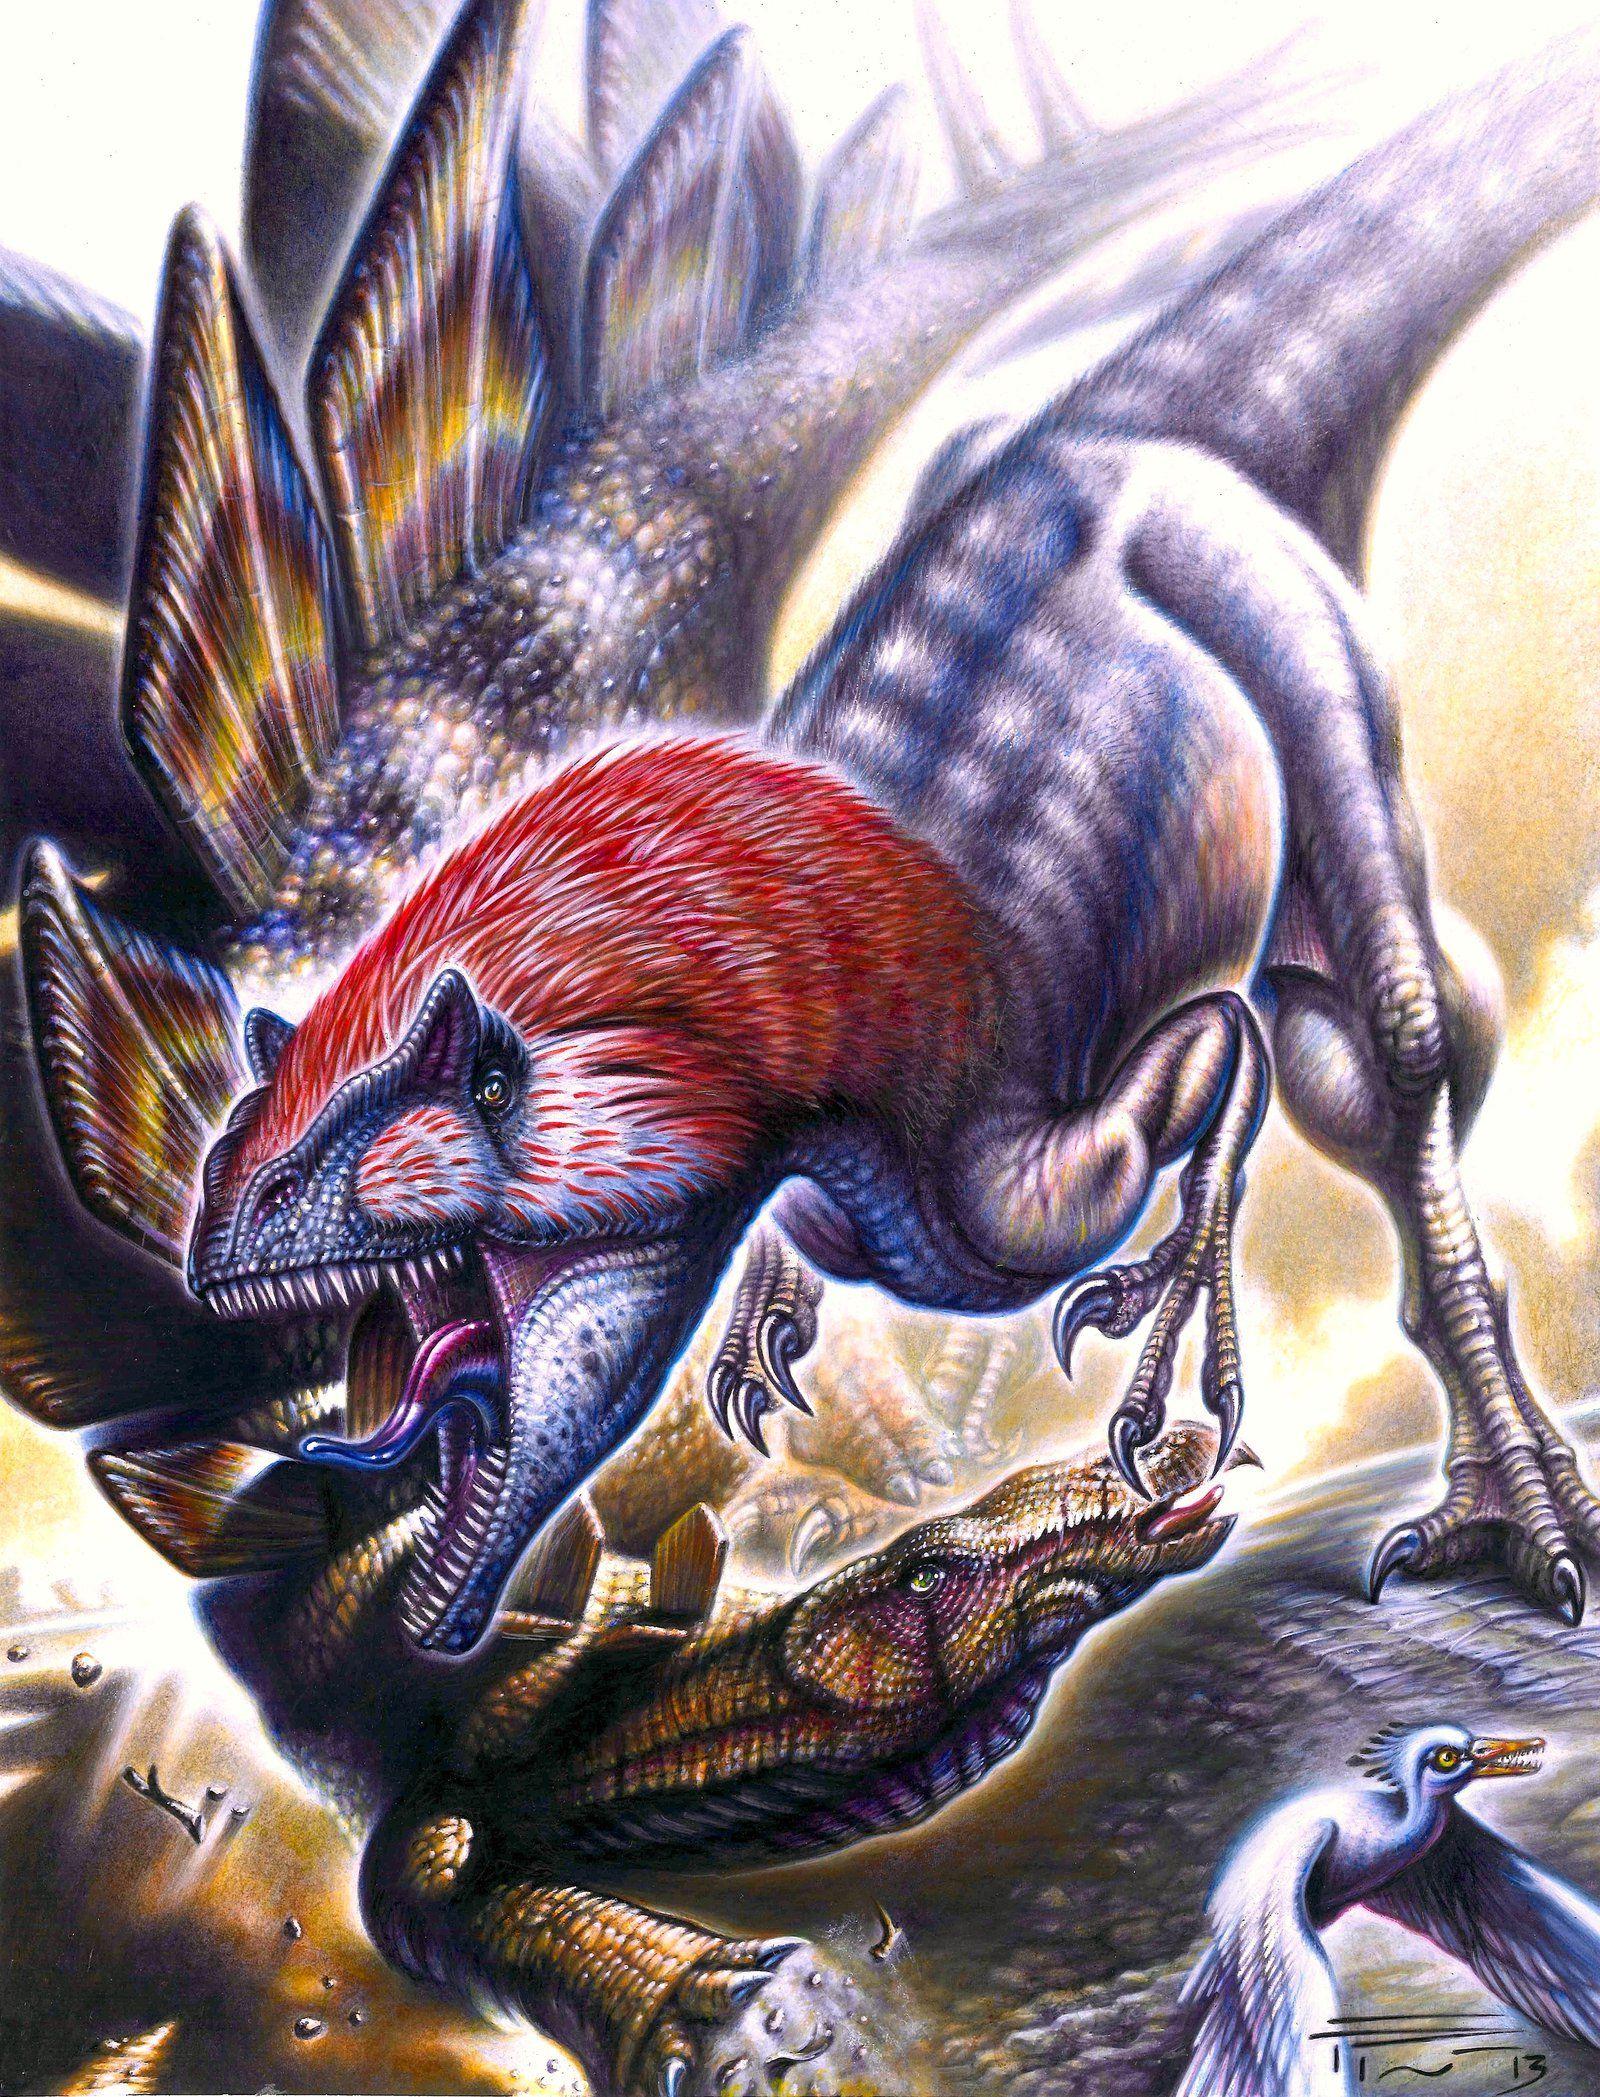 allosaurus maximus - Google Search